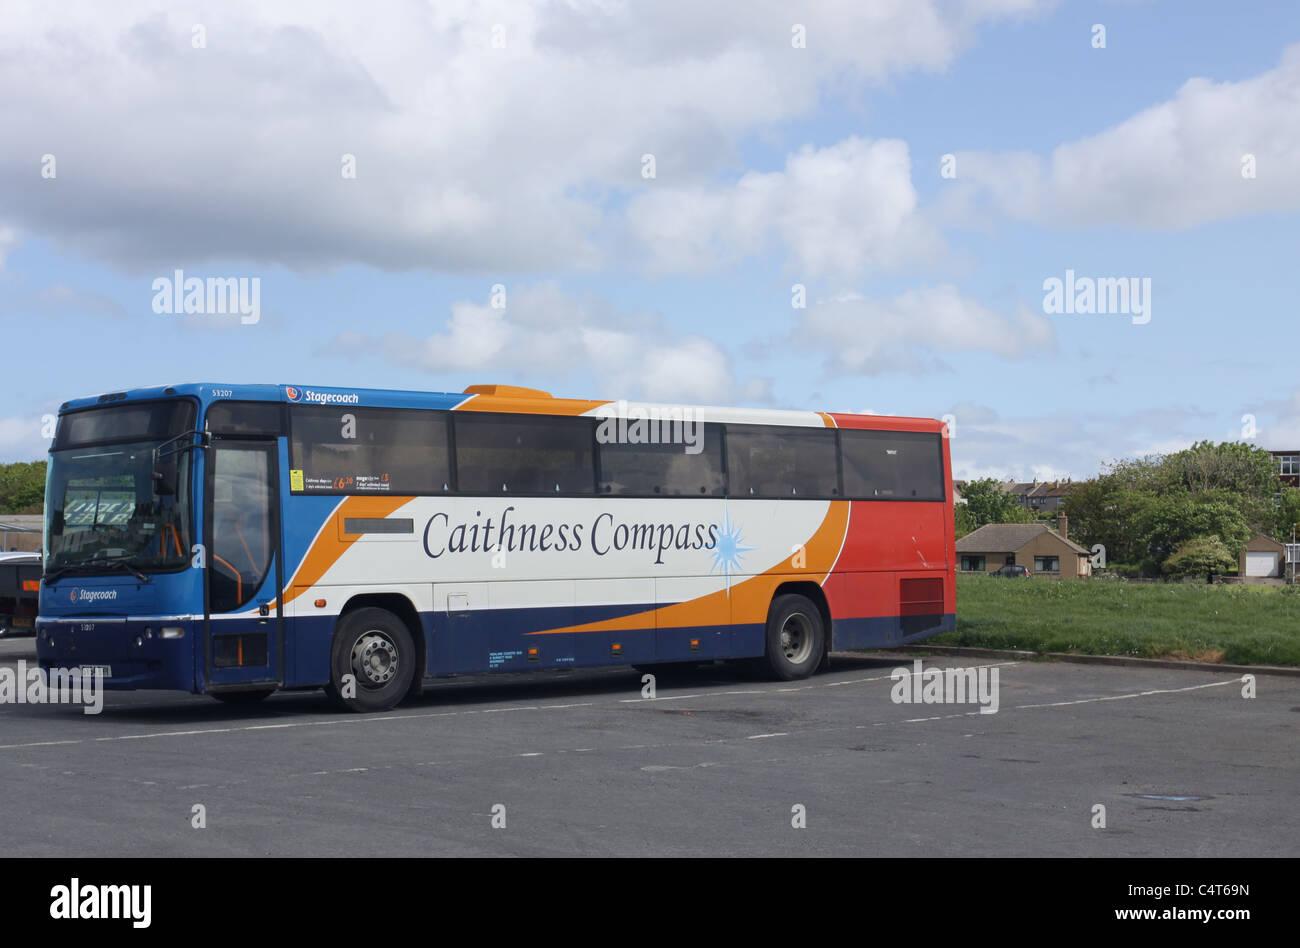 Caithness bus Thurso Scotland May 2011 - Stock Image